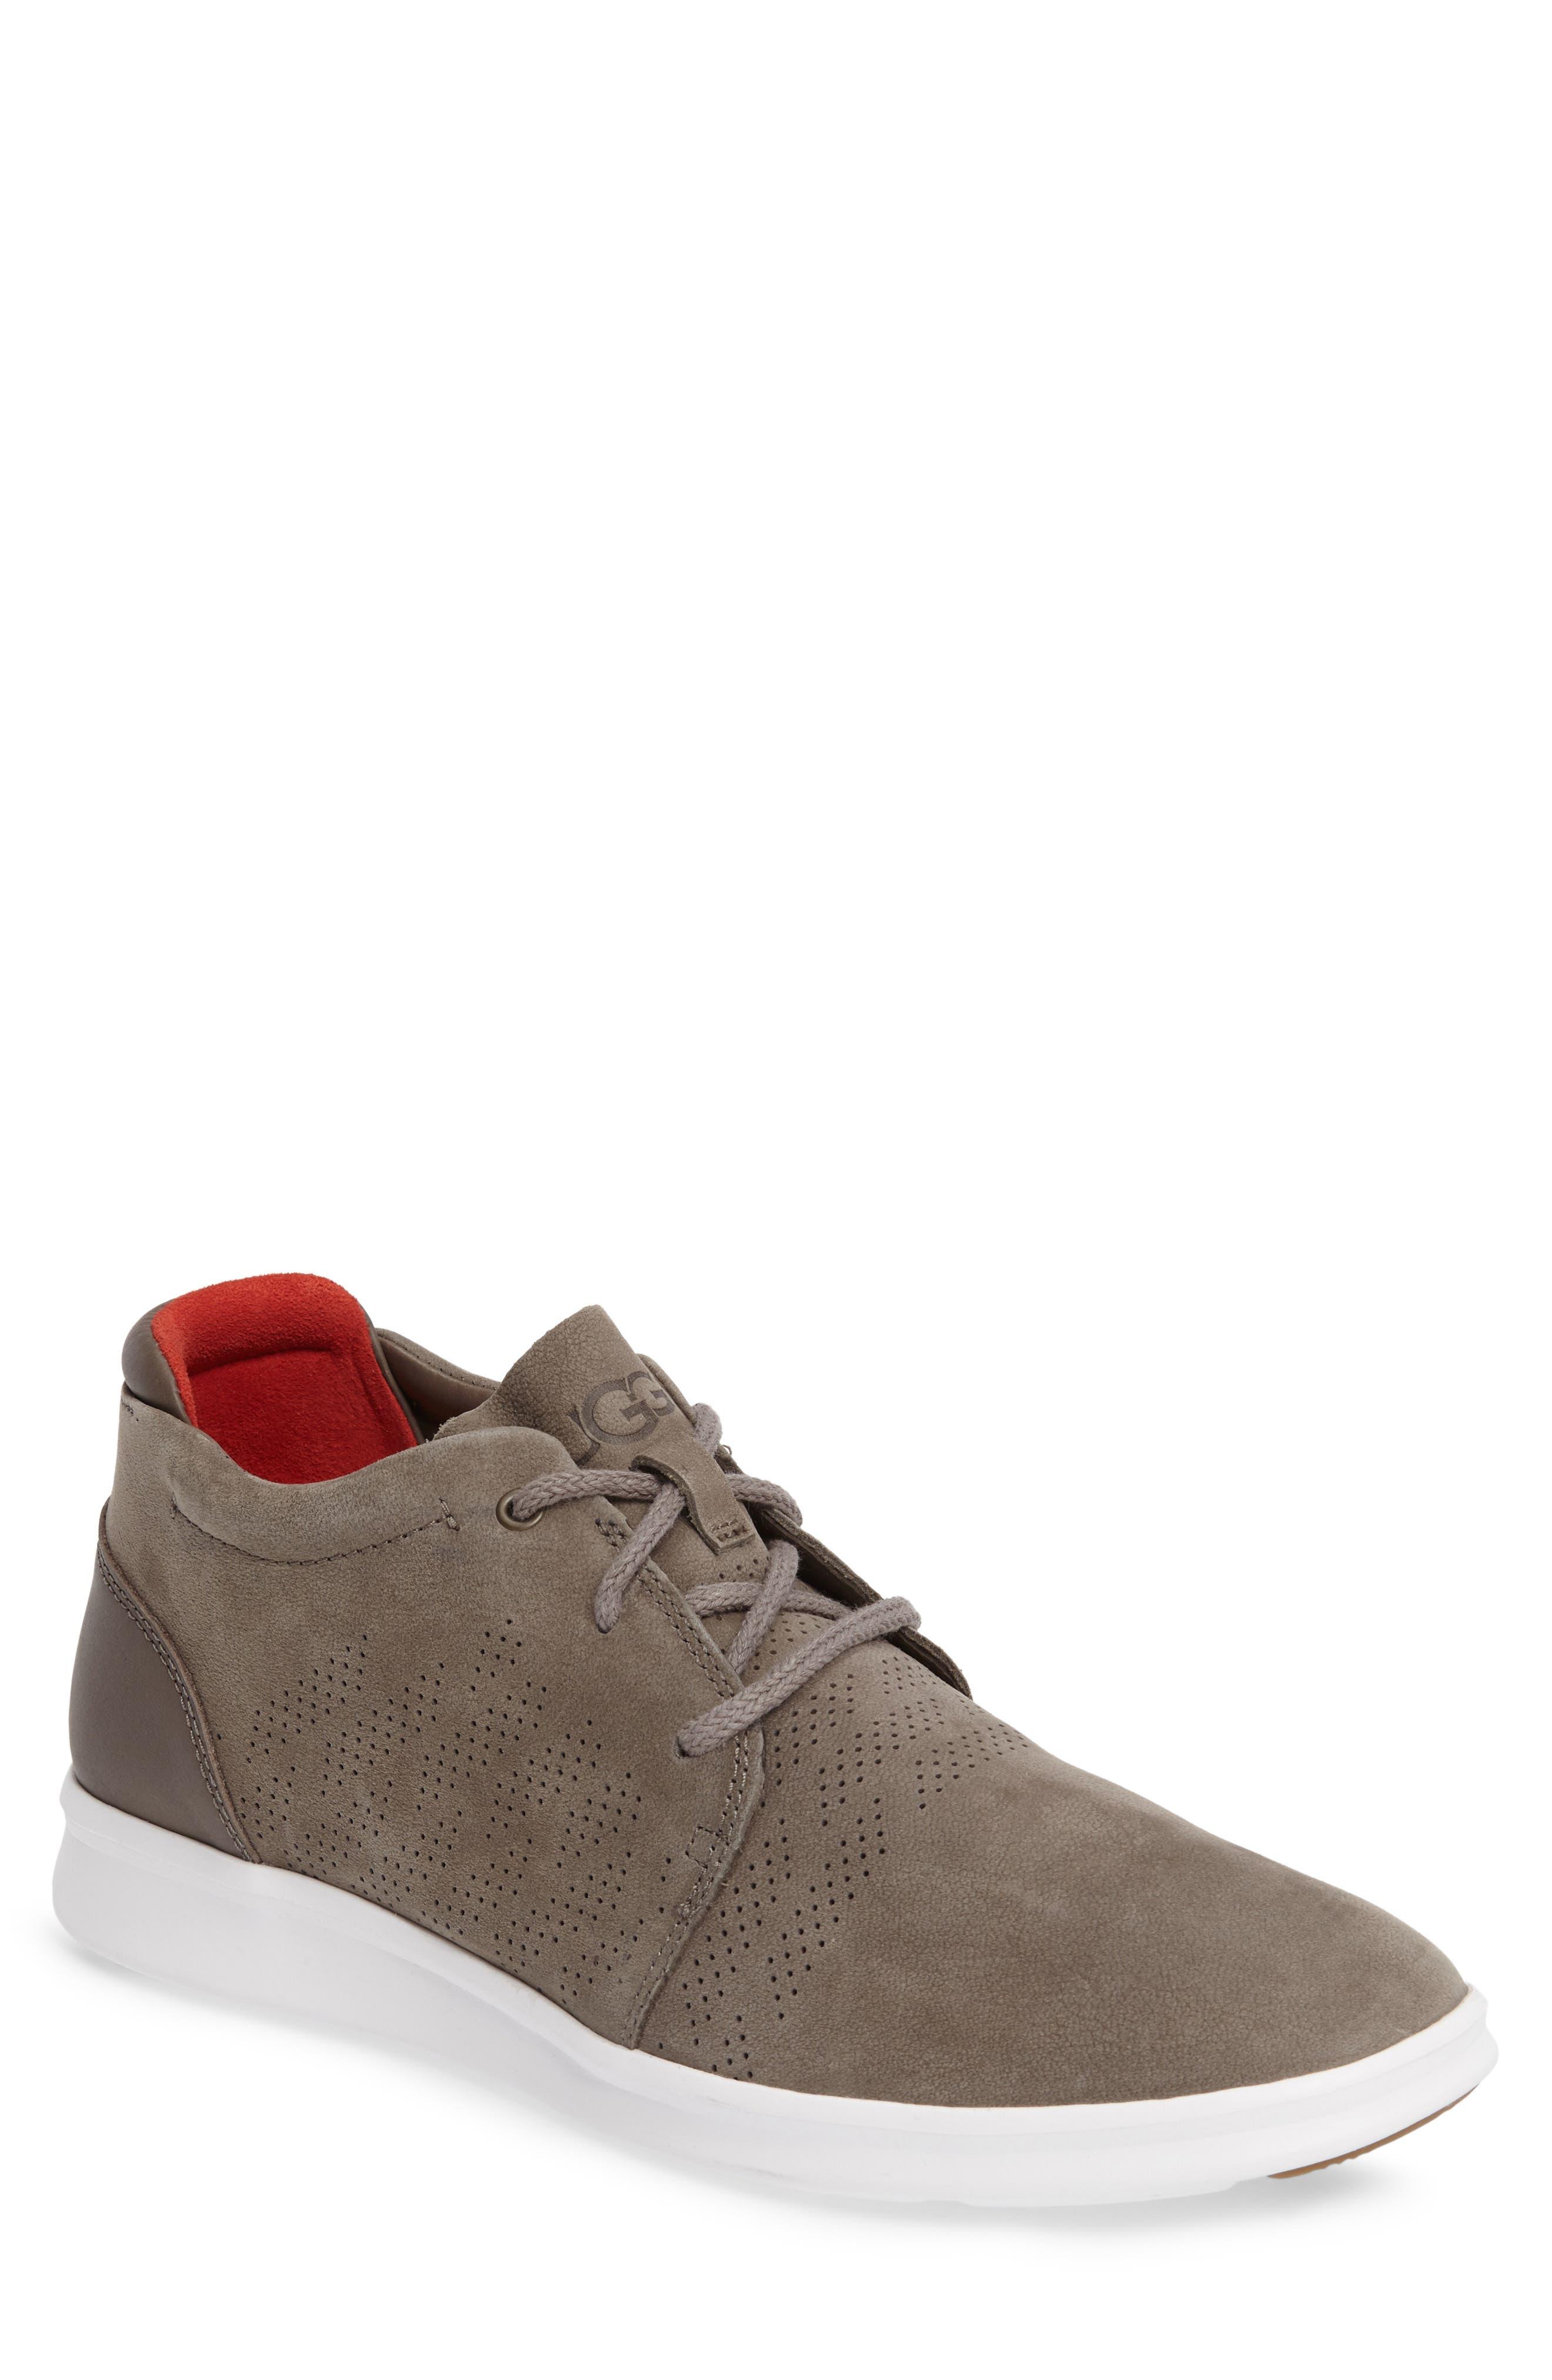 Larken Chukka Sneaker,                             Main thumbnail 1, color,                             Mole